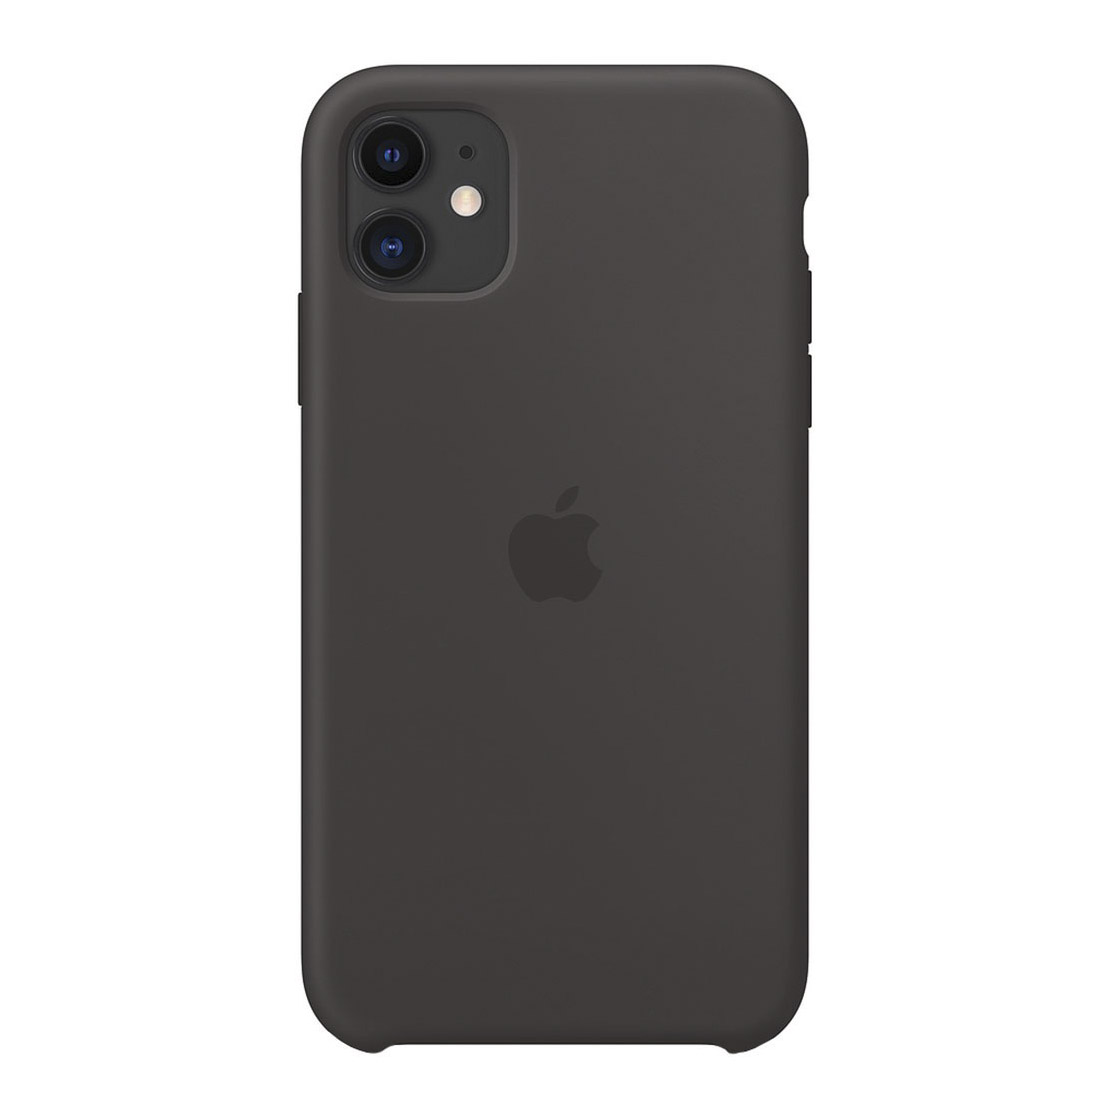 Чехол для смартфона Apple iPhone 11 Silicone Case, черный